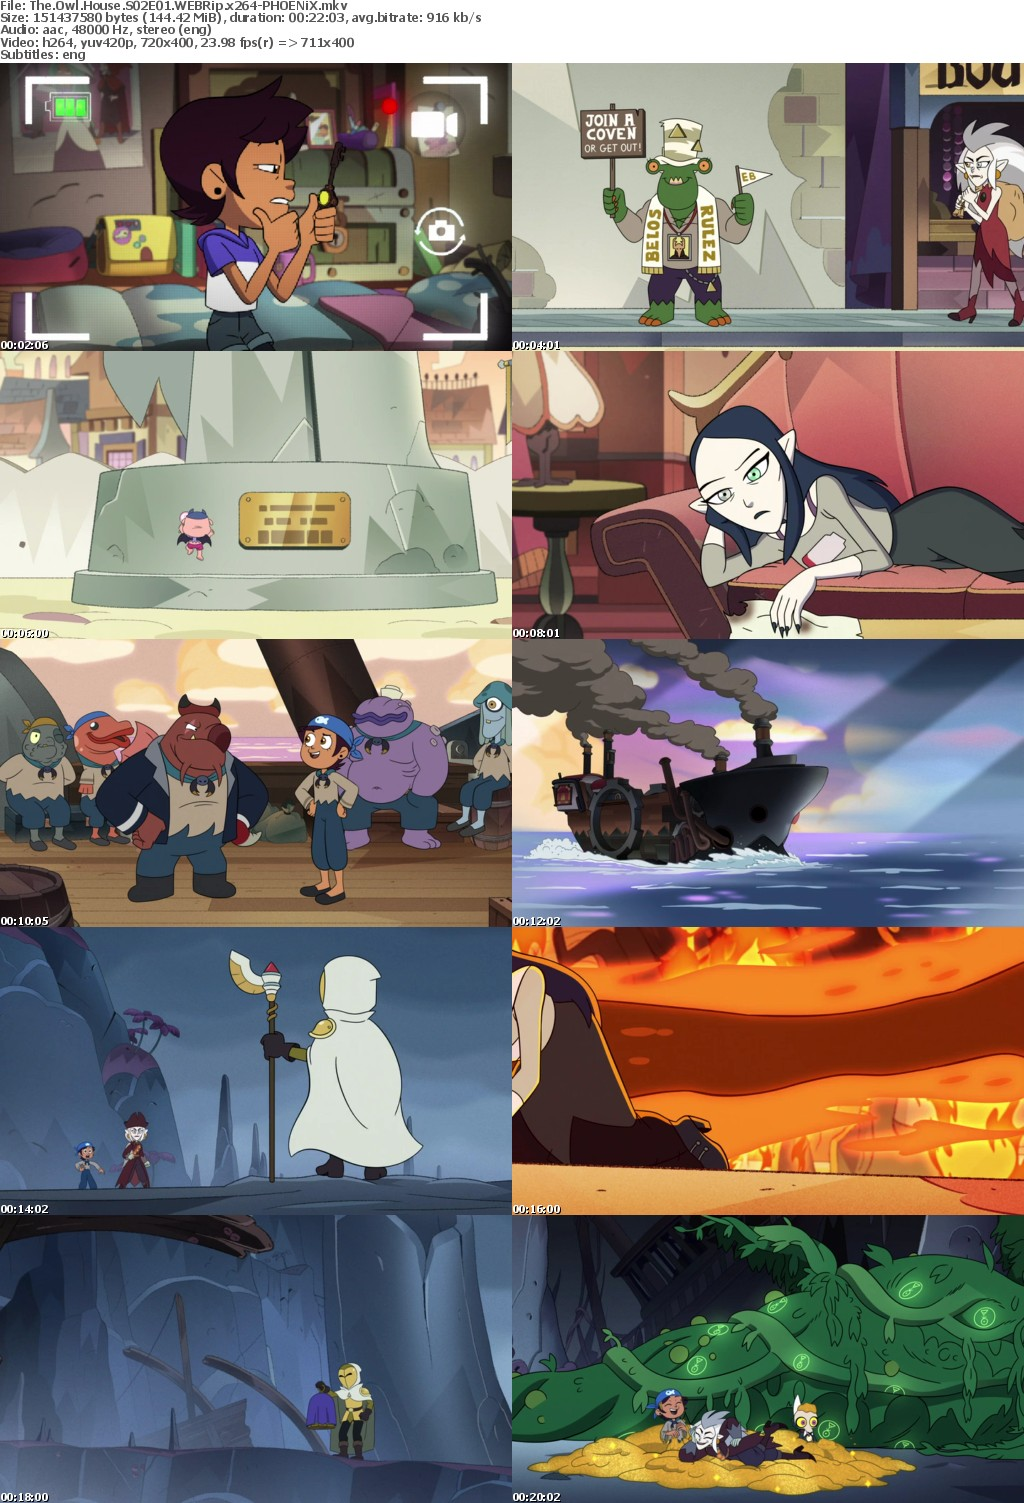 The Owl House S02E01 WEBRip x264-PHOENiX